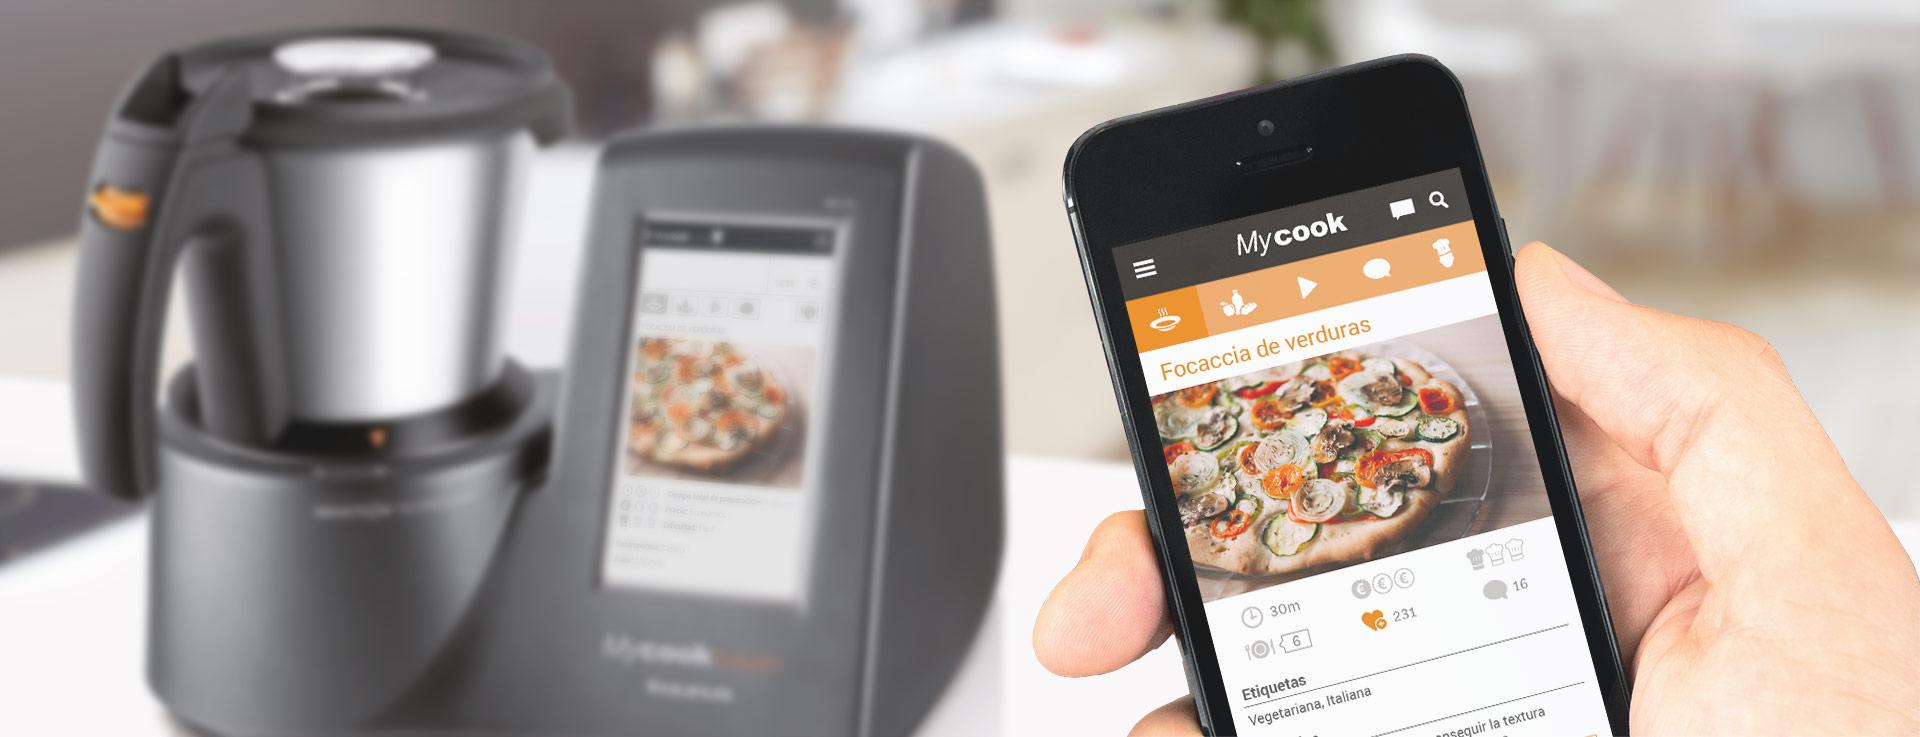 mycook-touch-conexion-multidispositivo